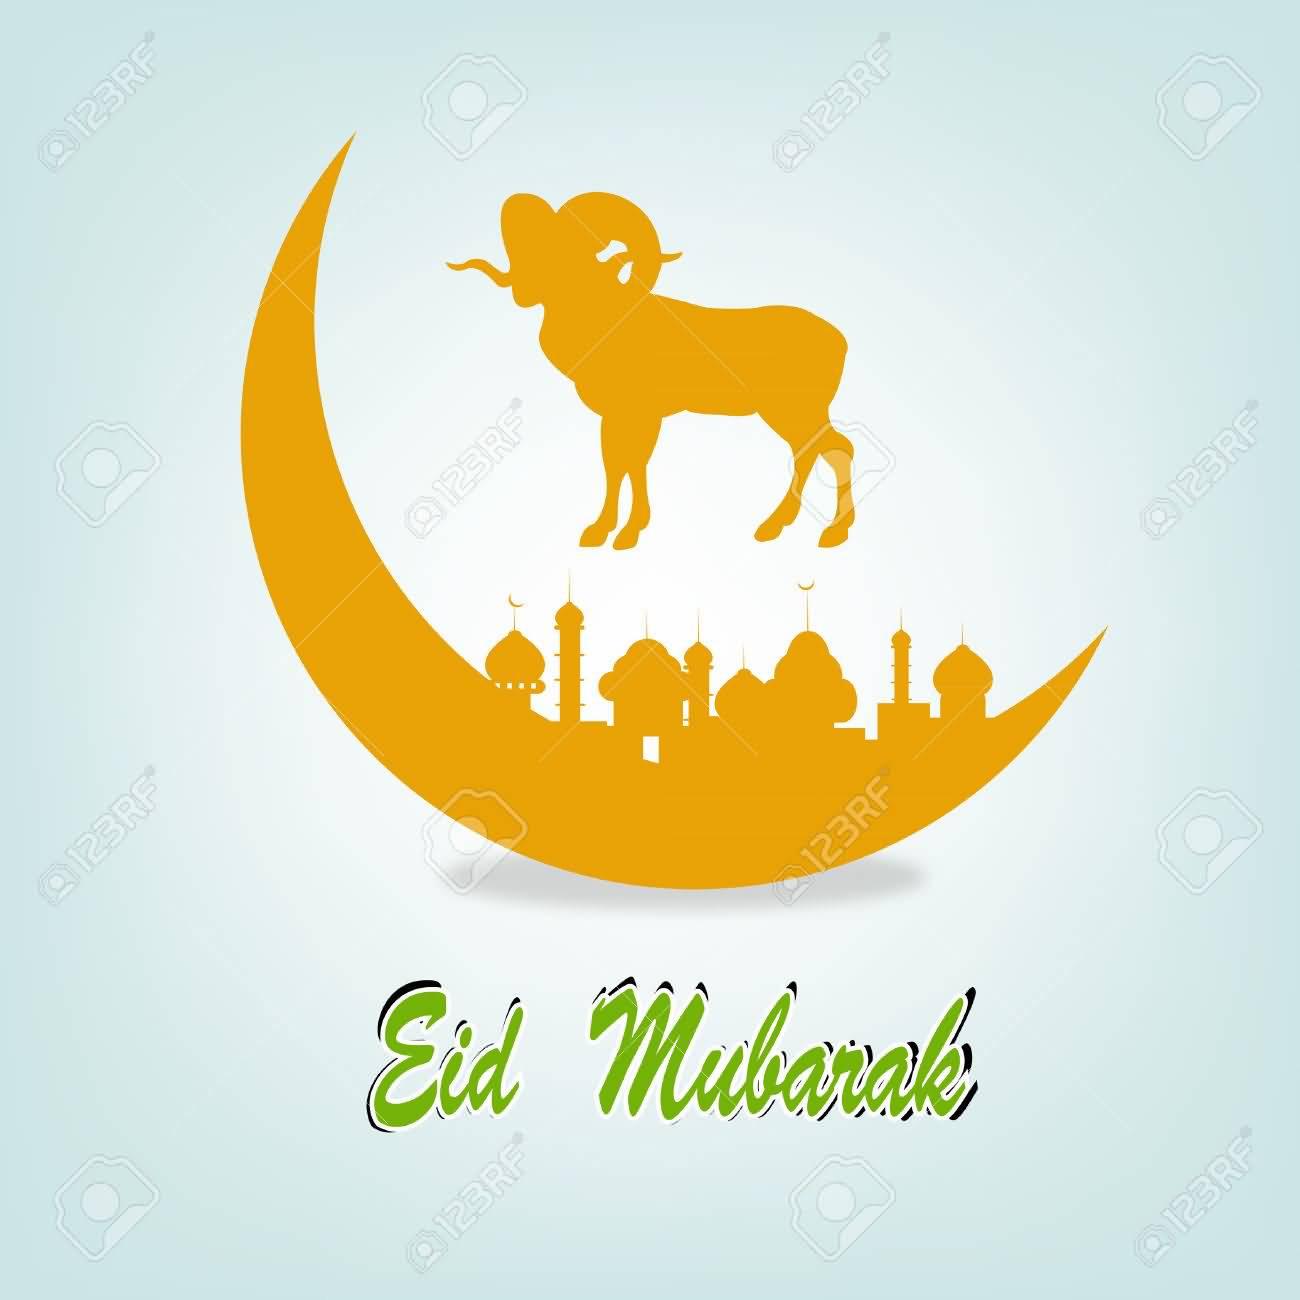 20 Wonderful Eid Mubarak Ideas: 60 Wonderful Eid Al-Adha Wishes Pictures And Photos